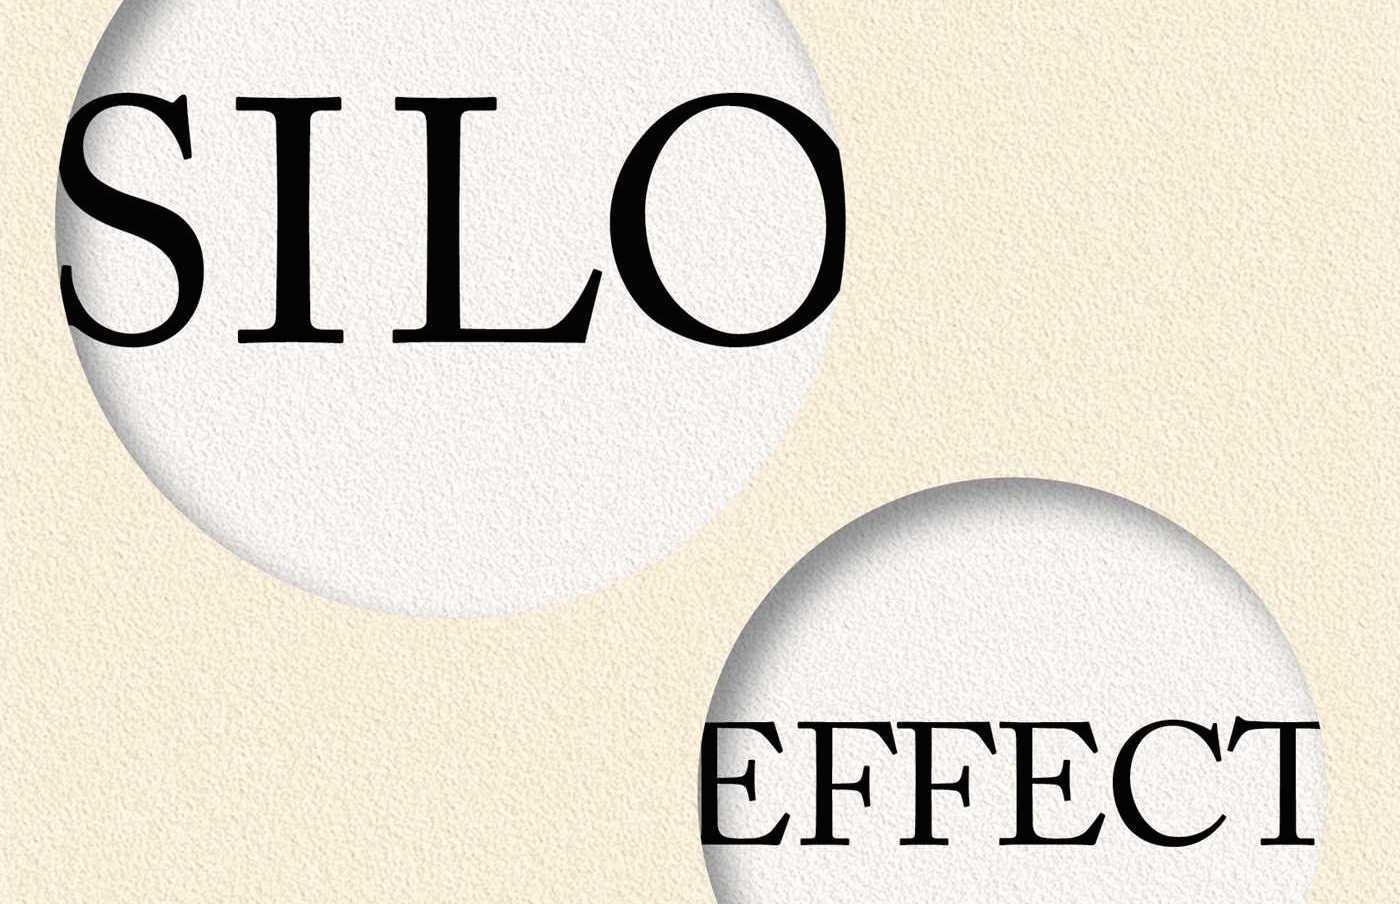 silo effect in organisation